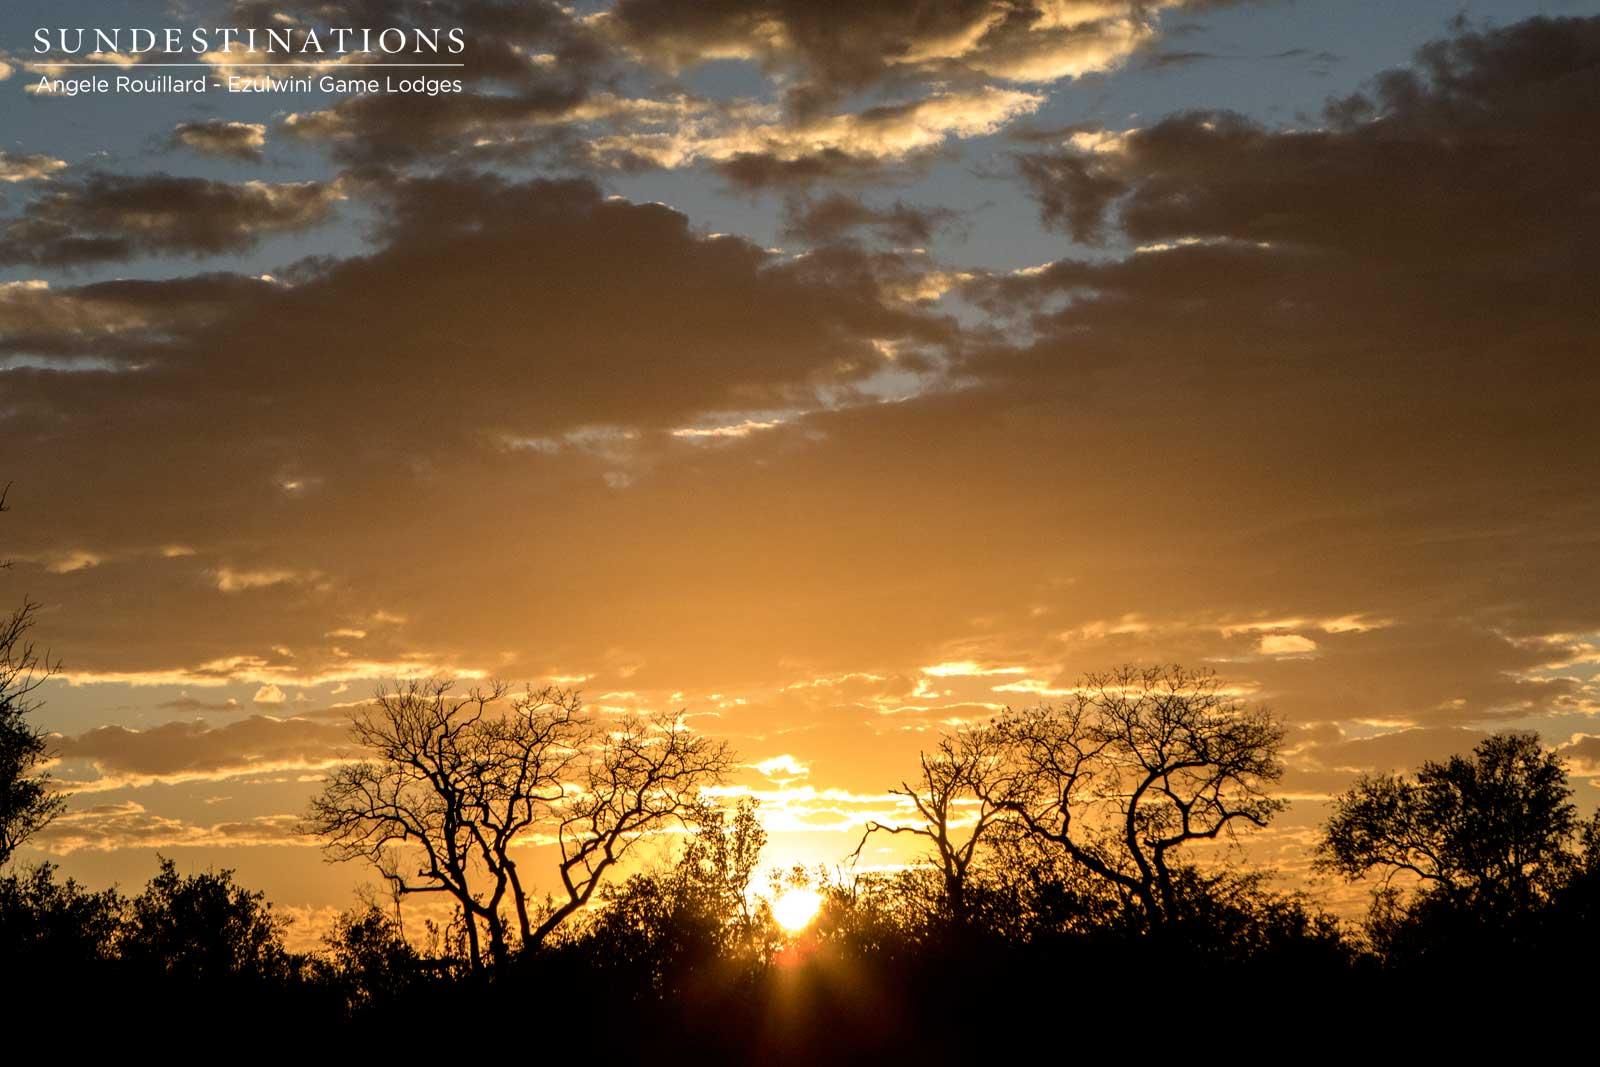 Sunsets at Ezulwini Game Lodges